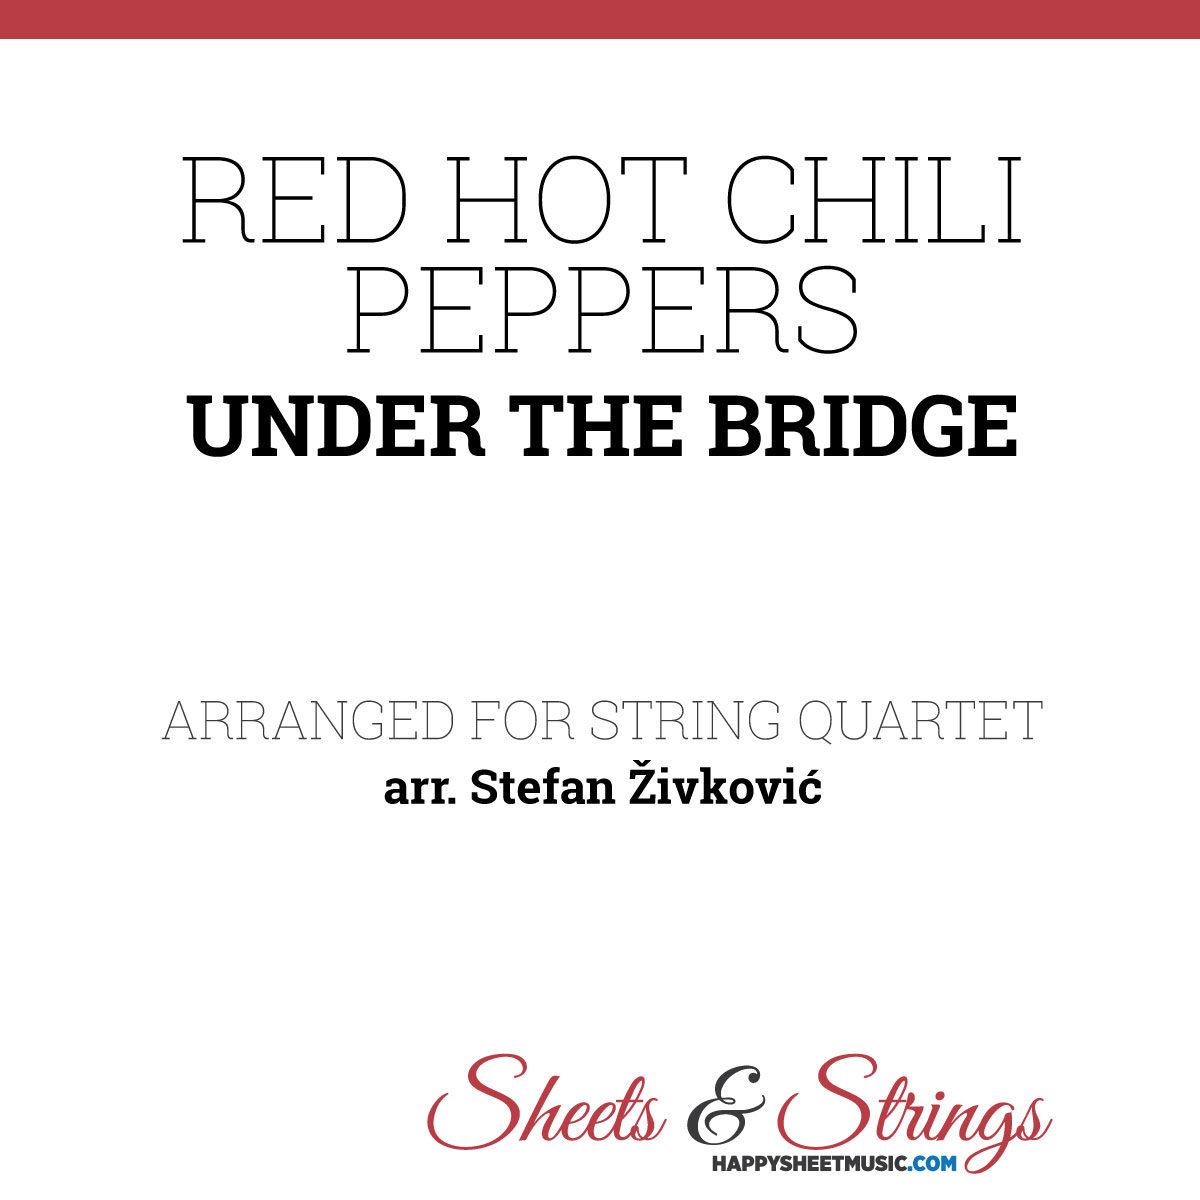 Red Hot Chili Peppers Under The Bridge Sheet Music for String Quartet - Violin Sheet Music - Viola Sheet Music - Cello Sheet Music